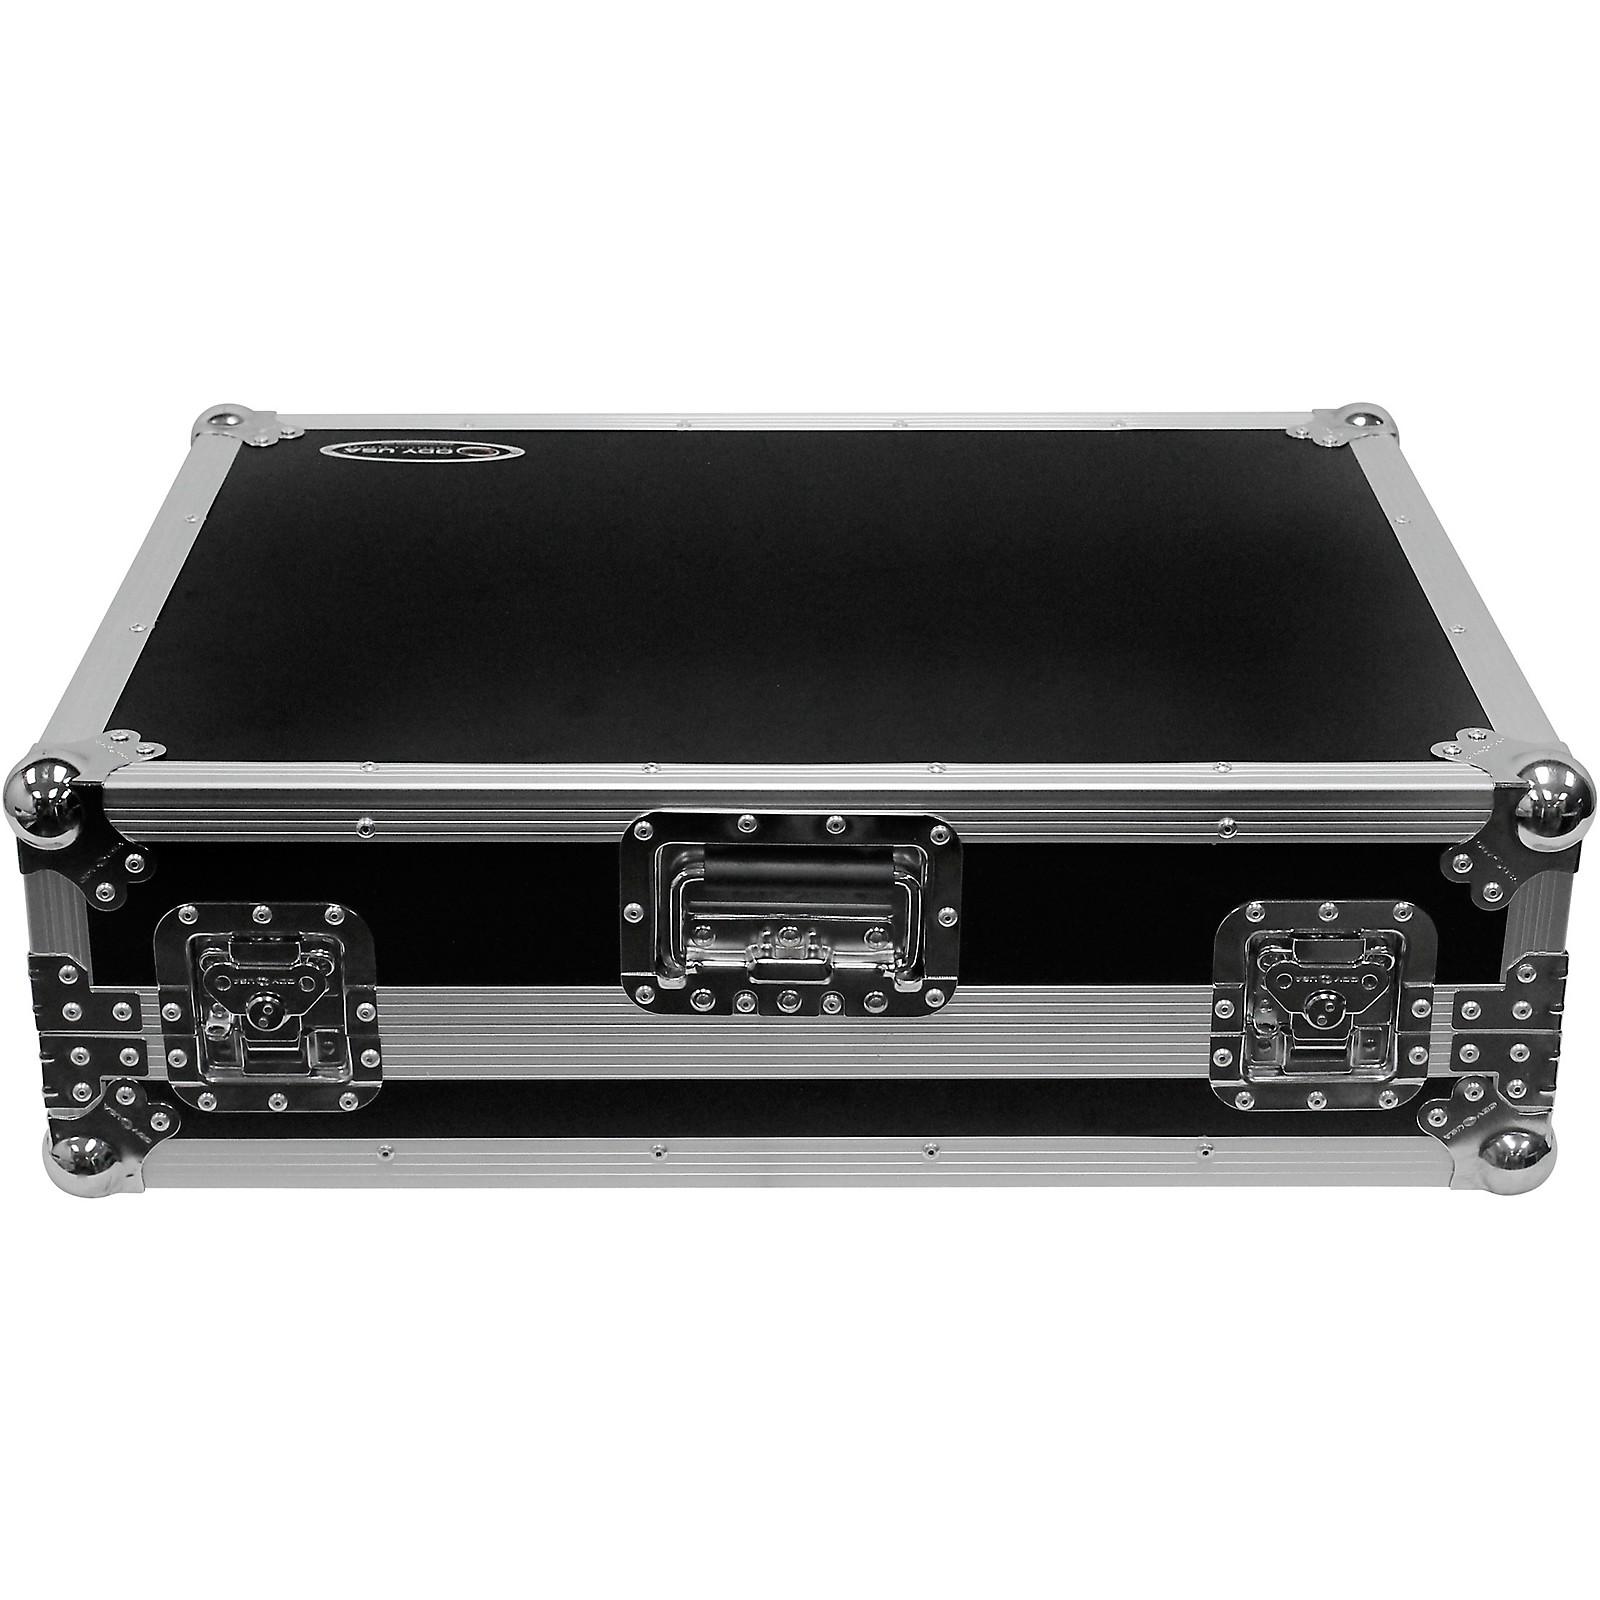 Odyssey Flight Ready FRMC7000 ATA Style Road Case for Denon MC7000 DJ Controller